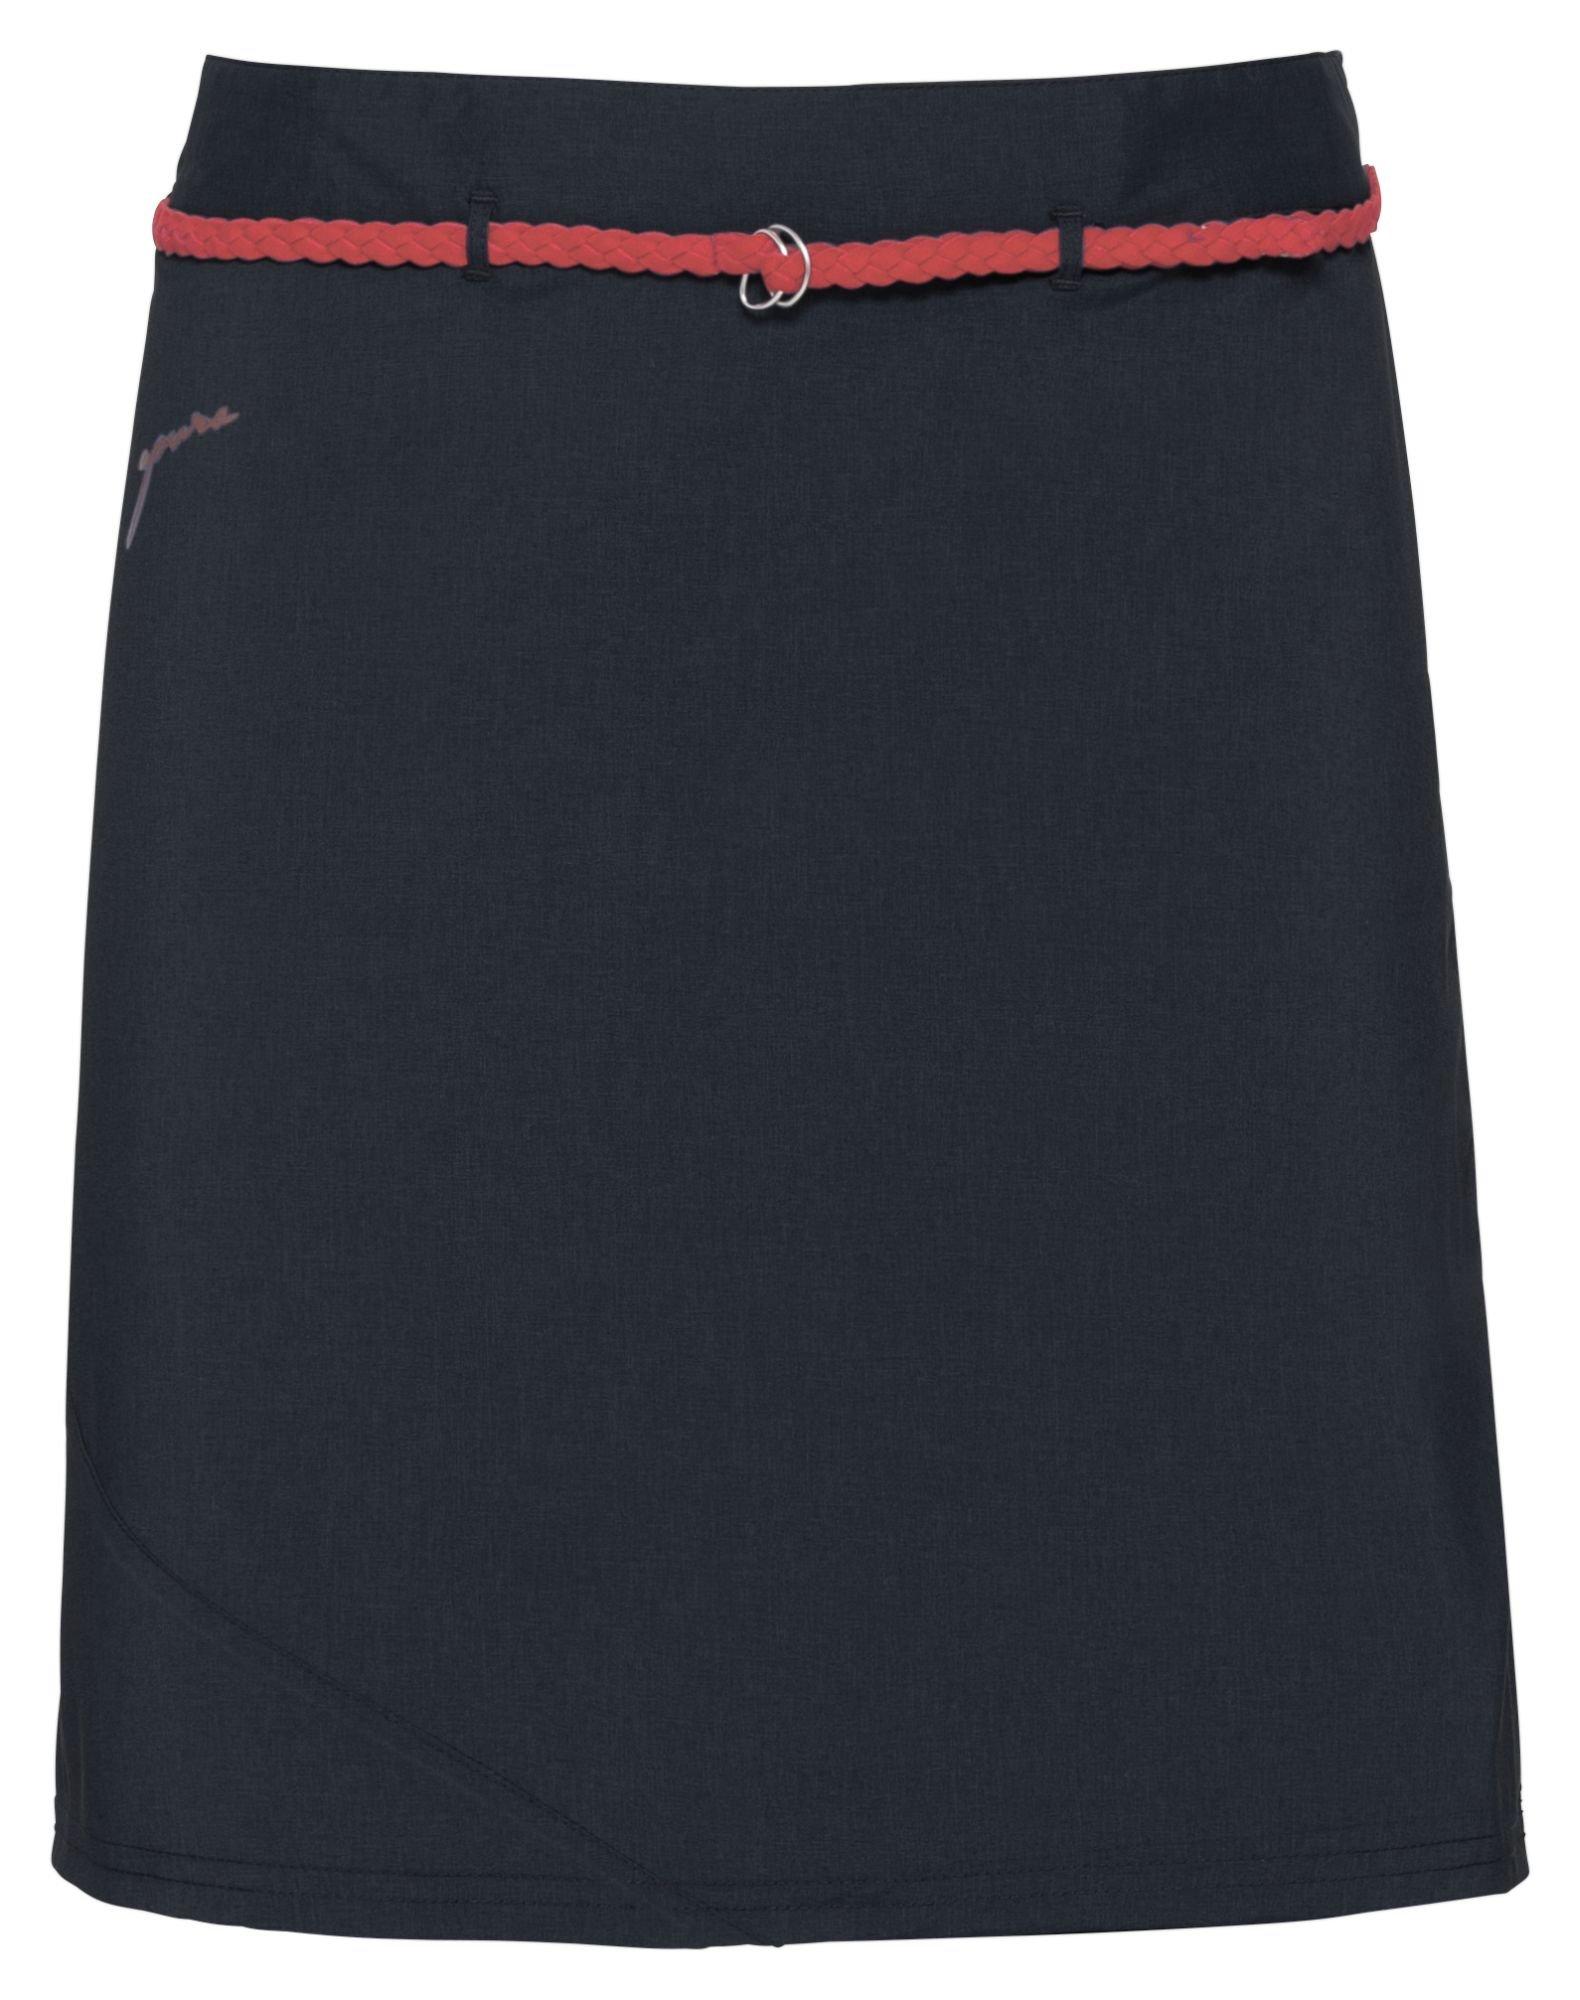 bekleidung/Hosen: Apura  Damen Wickelrock L